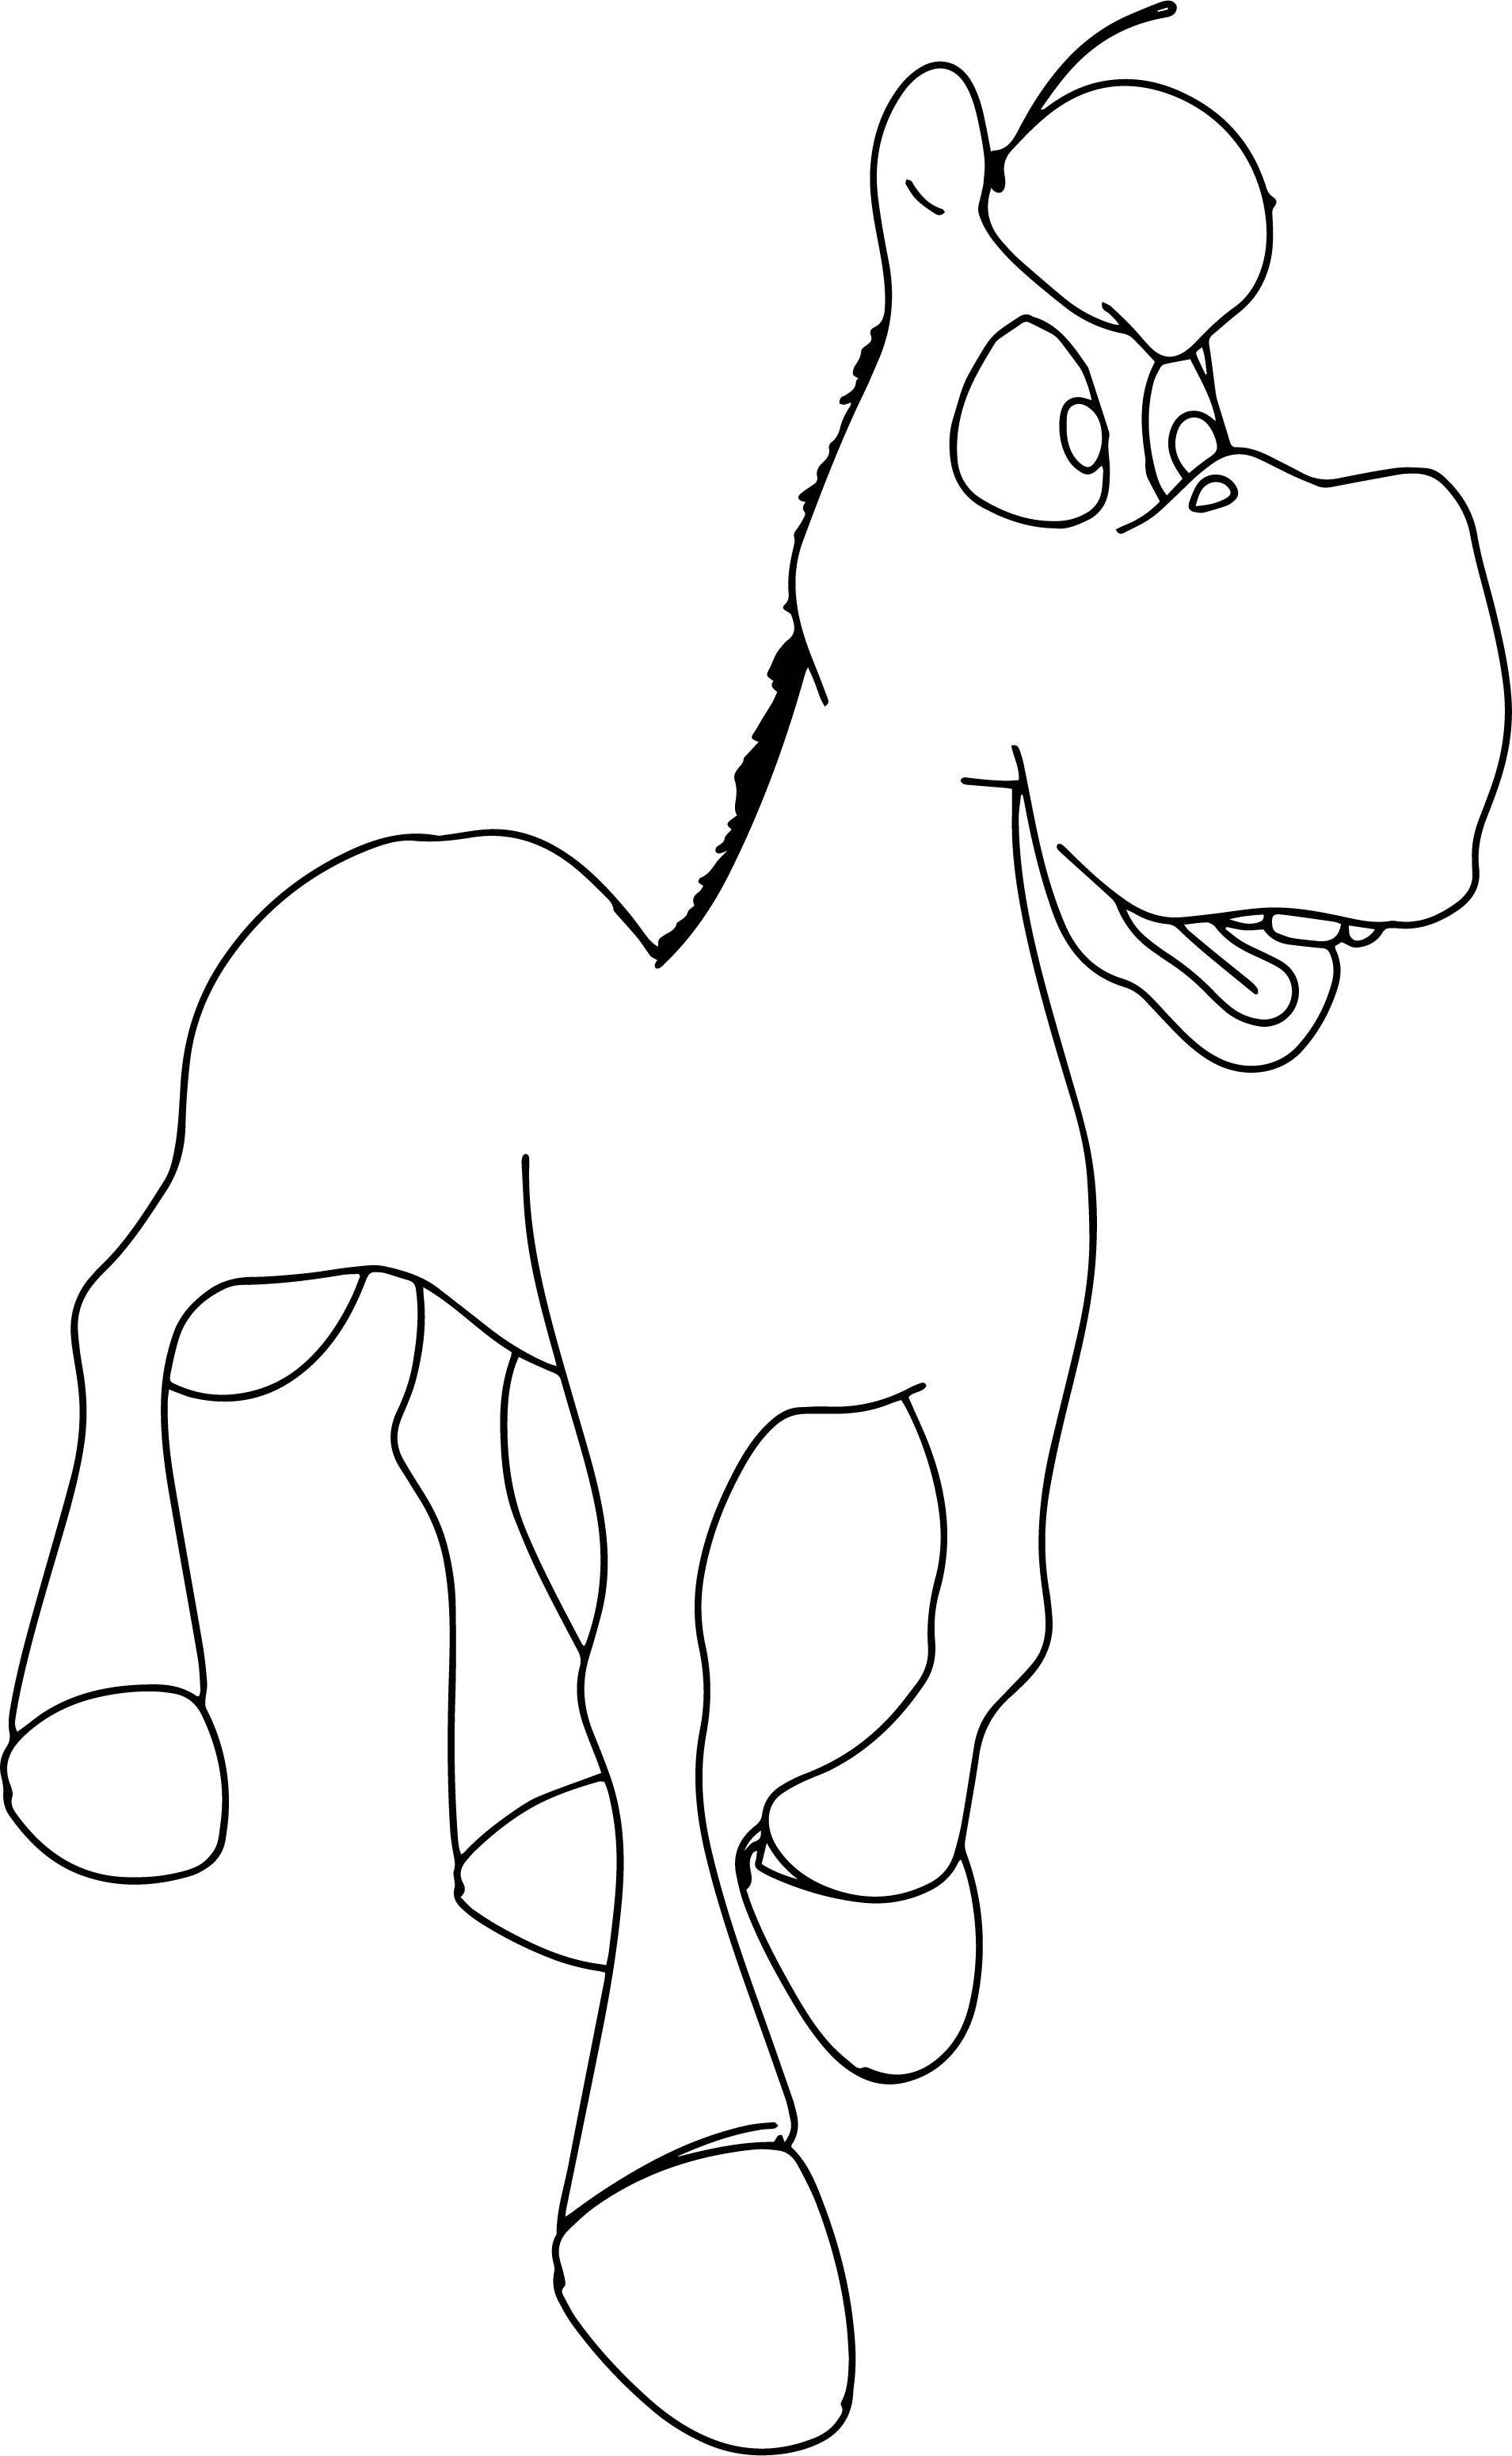 Nice Walking Cartoon Horse Coloring Page Horse Coloring Pages Horse Coloring Walking Cartoon